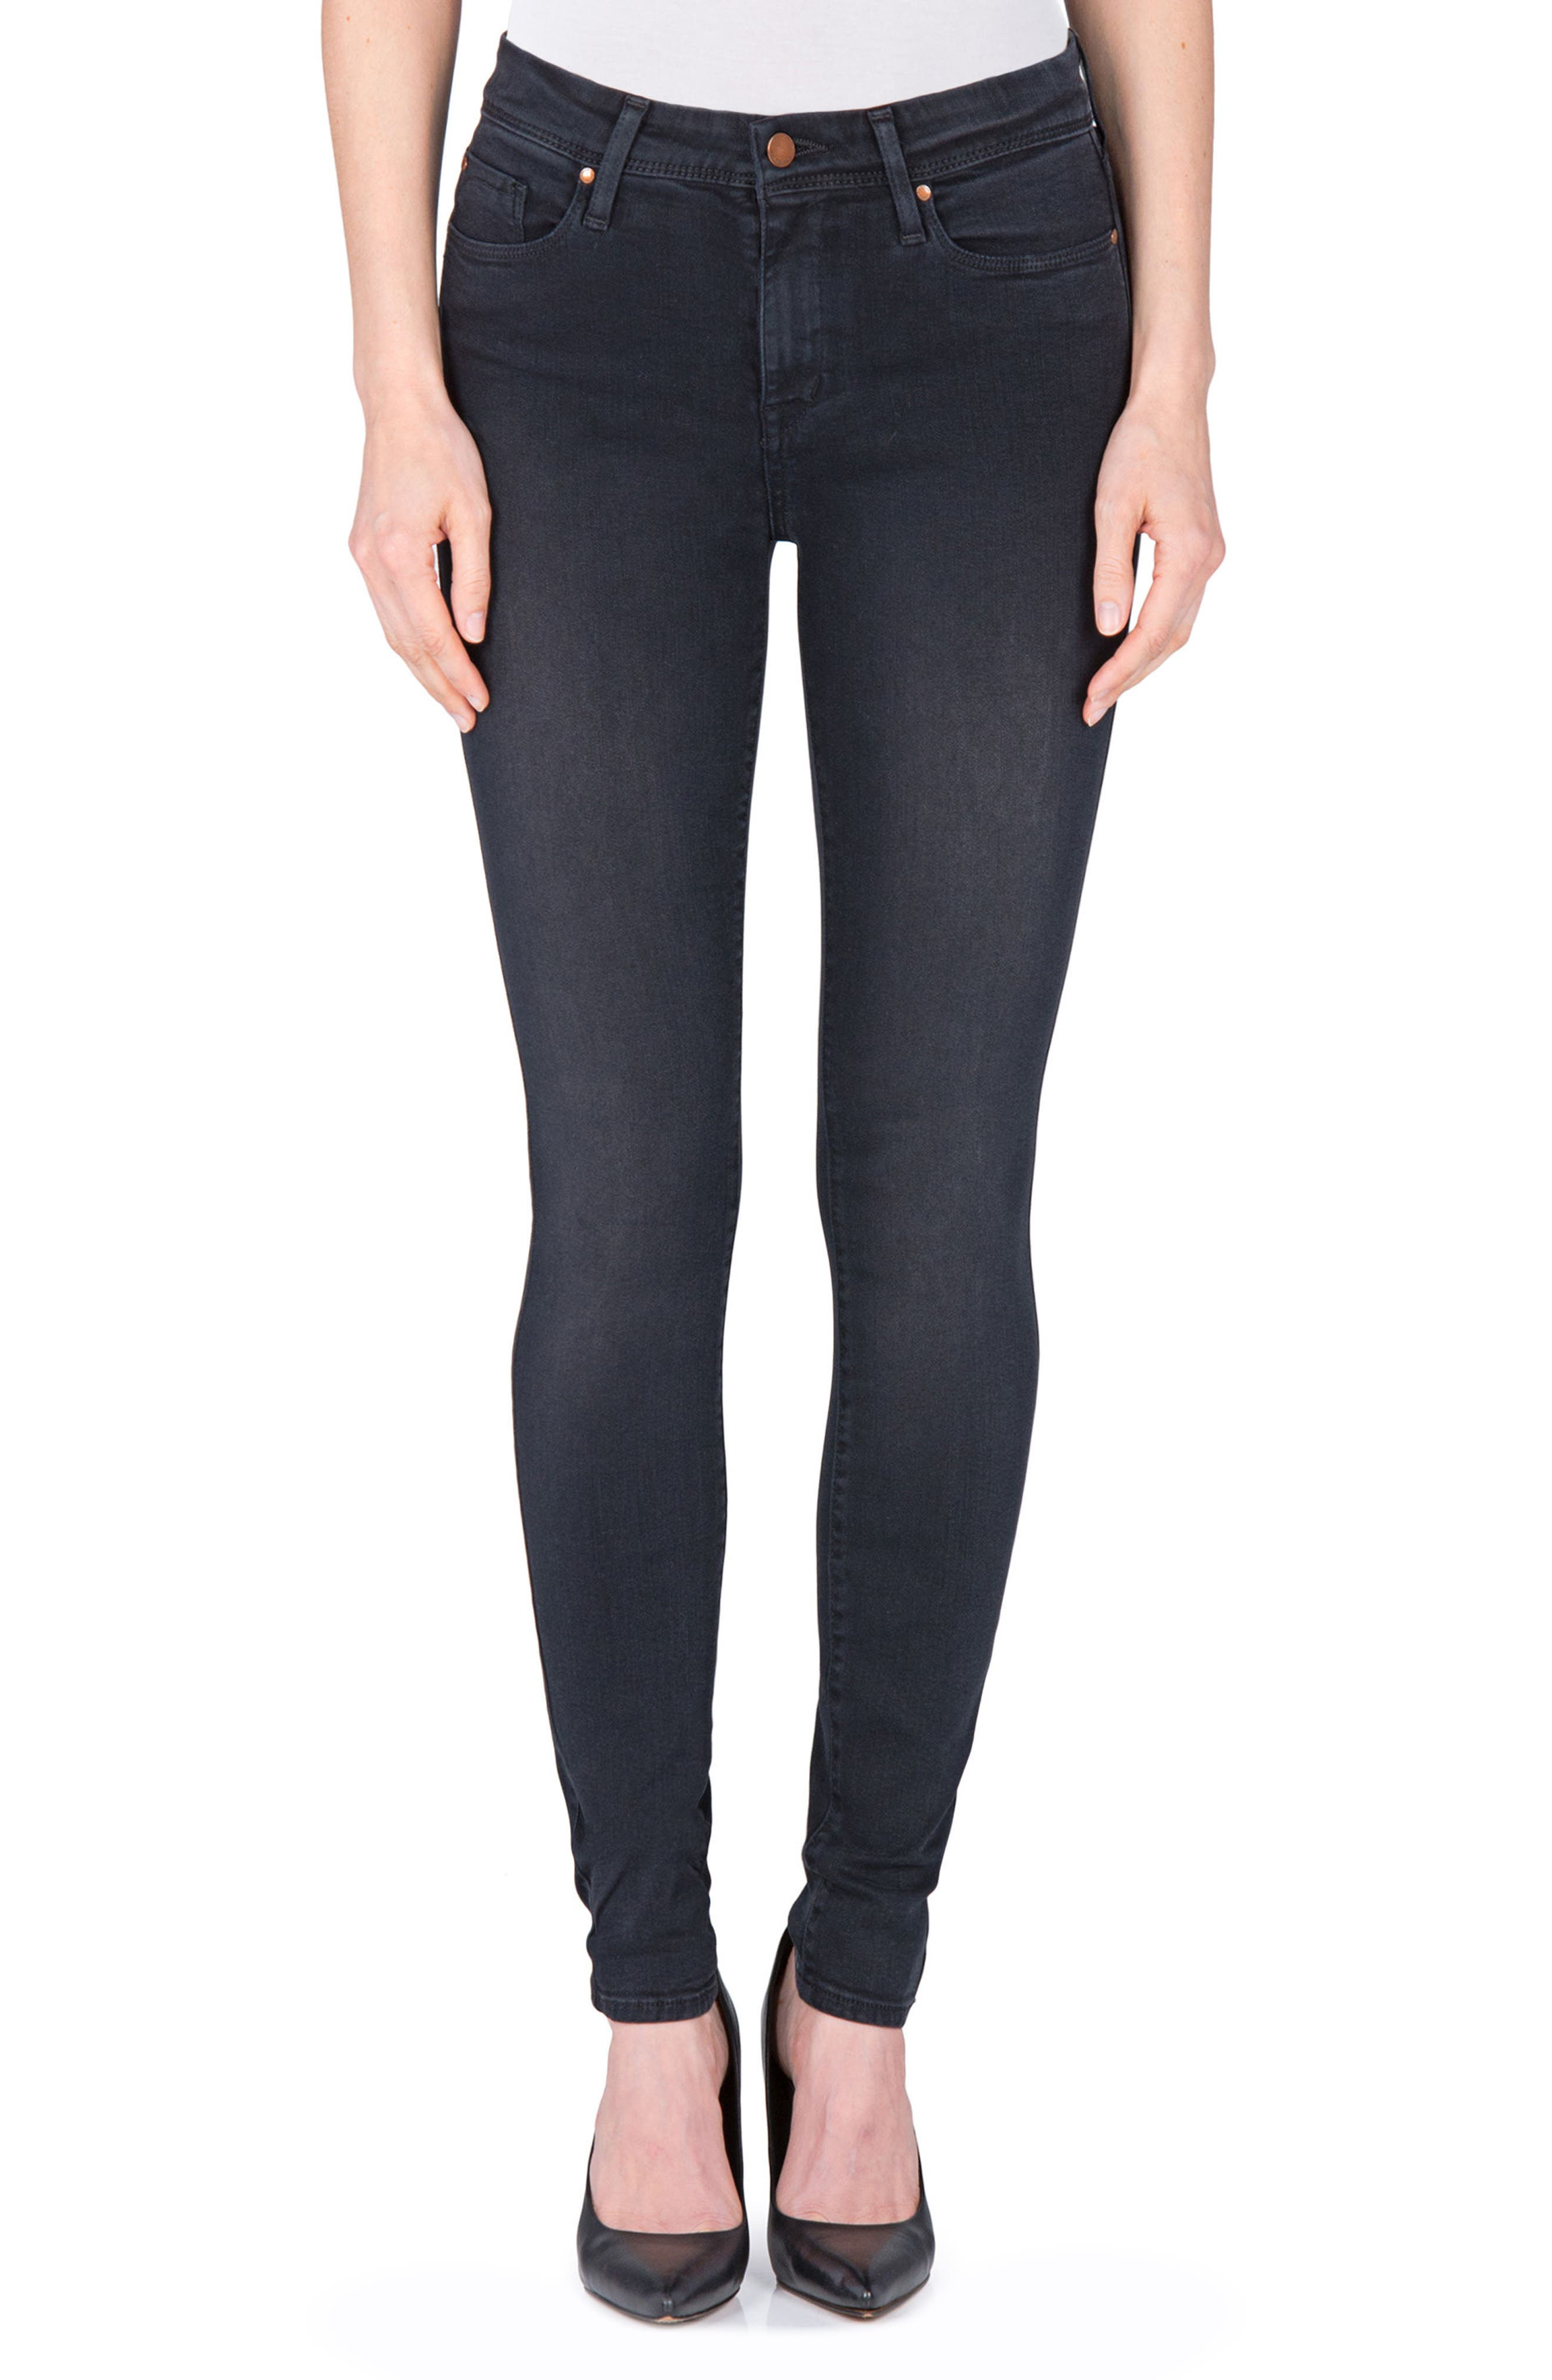 Belvedere Skinny Jeans,                         Main,                         color, 001